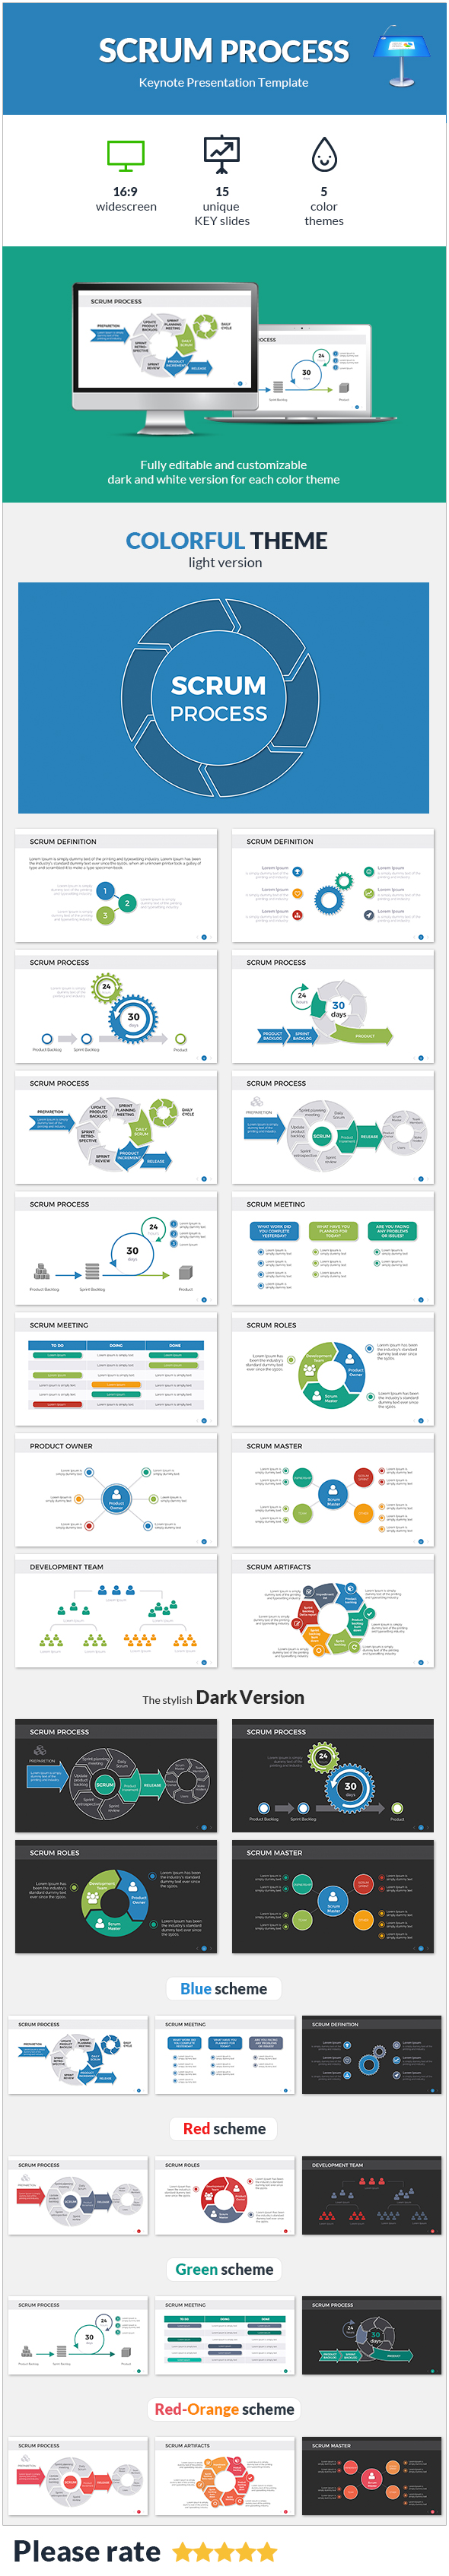 Scrum Process Keynote Presentation Template - Keynote Templates Presentation Templates